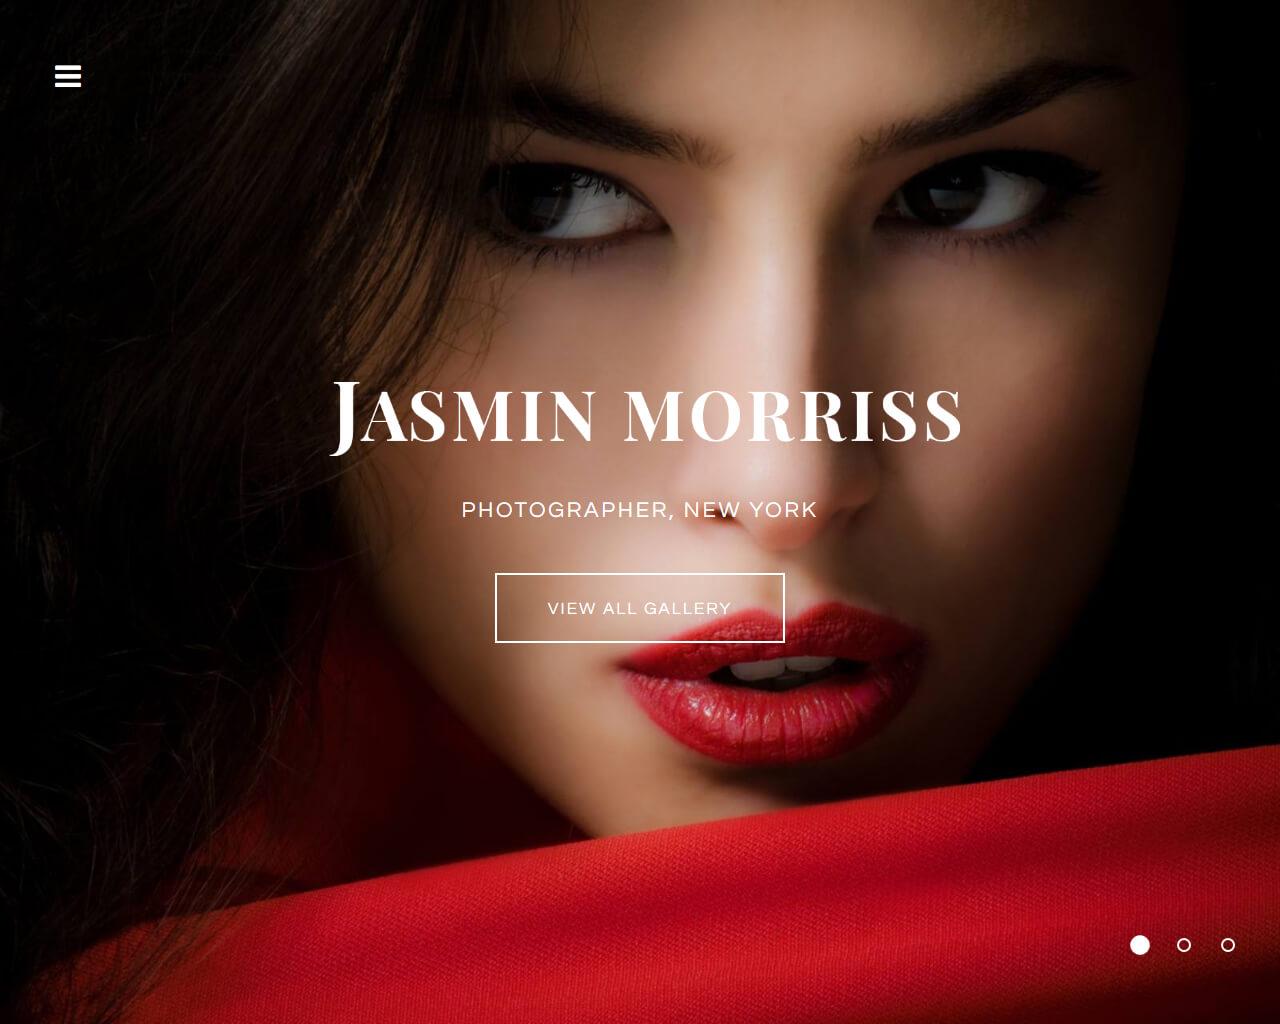 Jasmin Morris Website Template